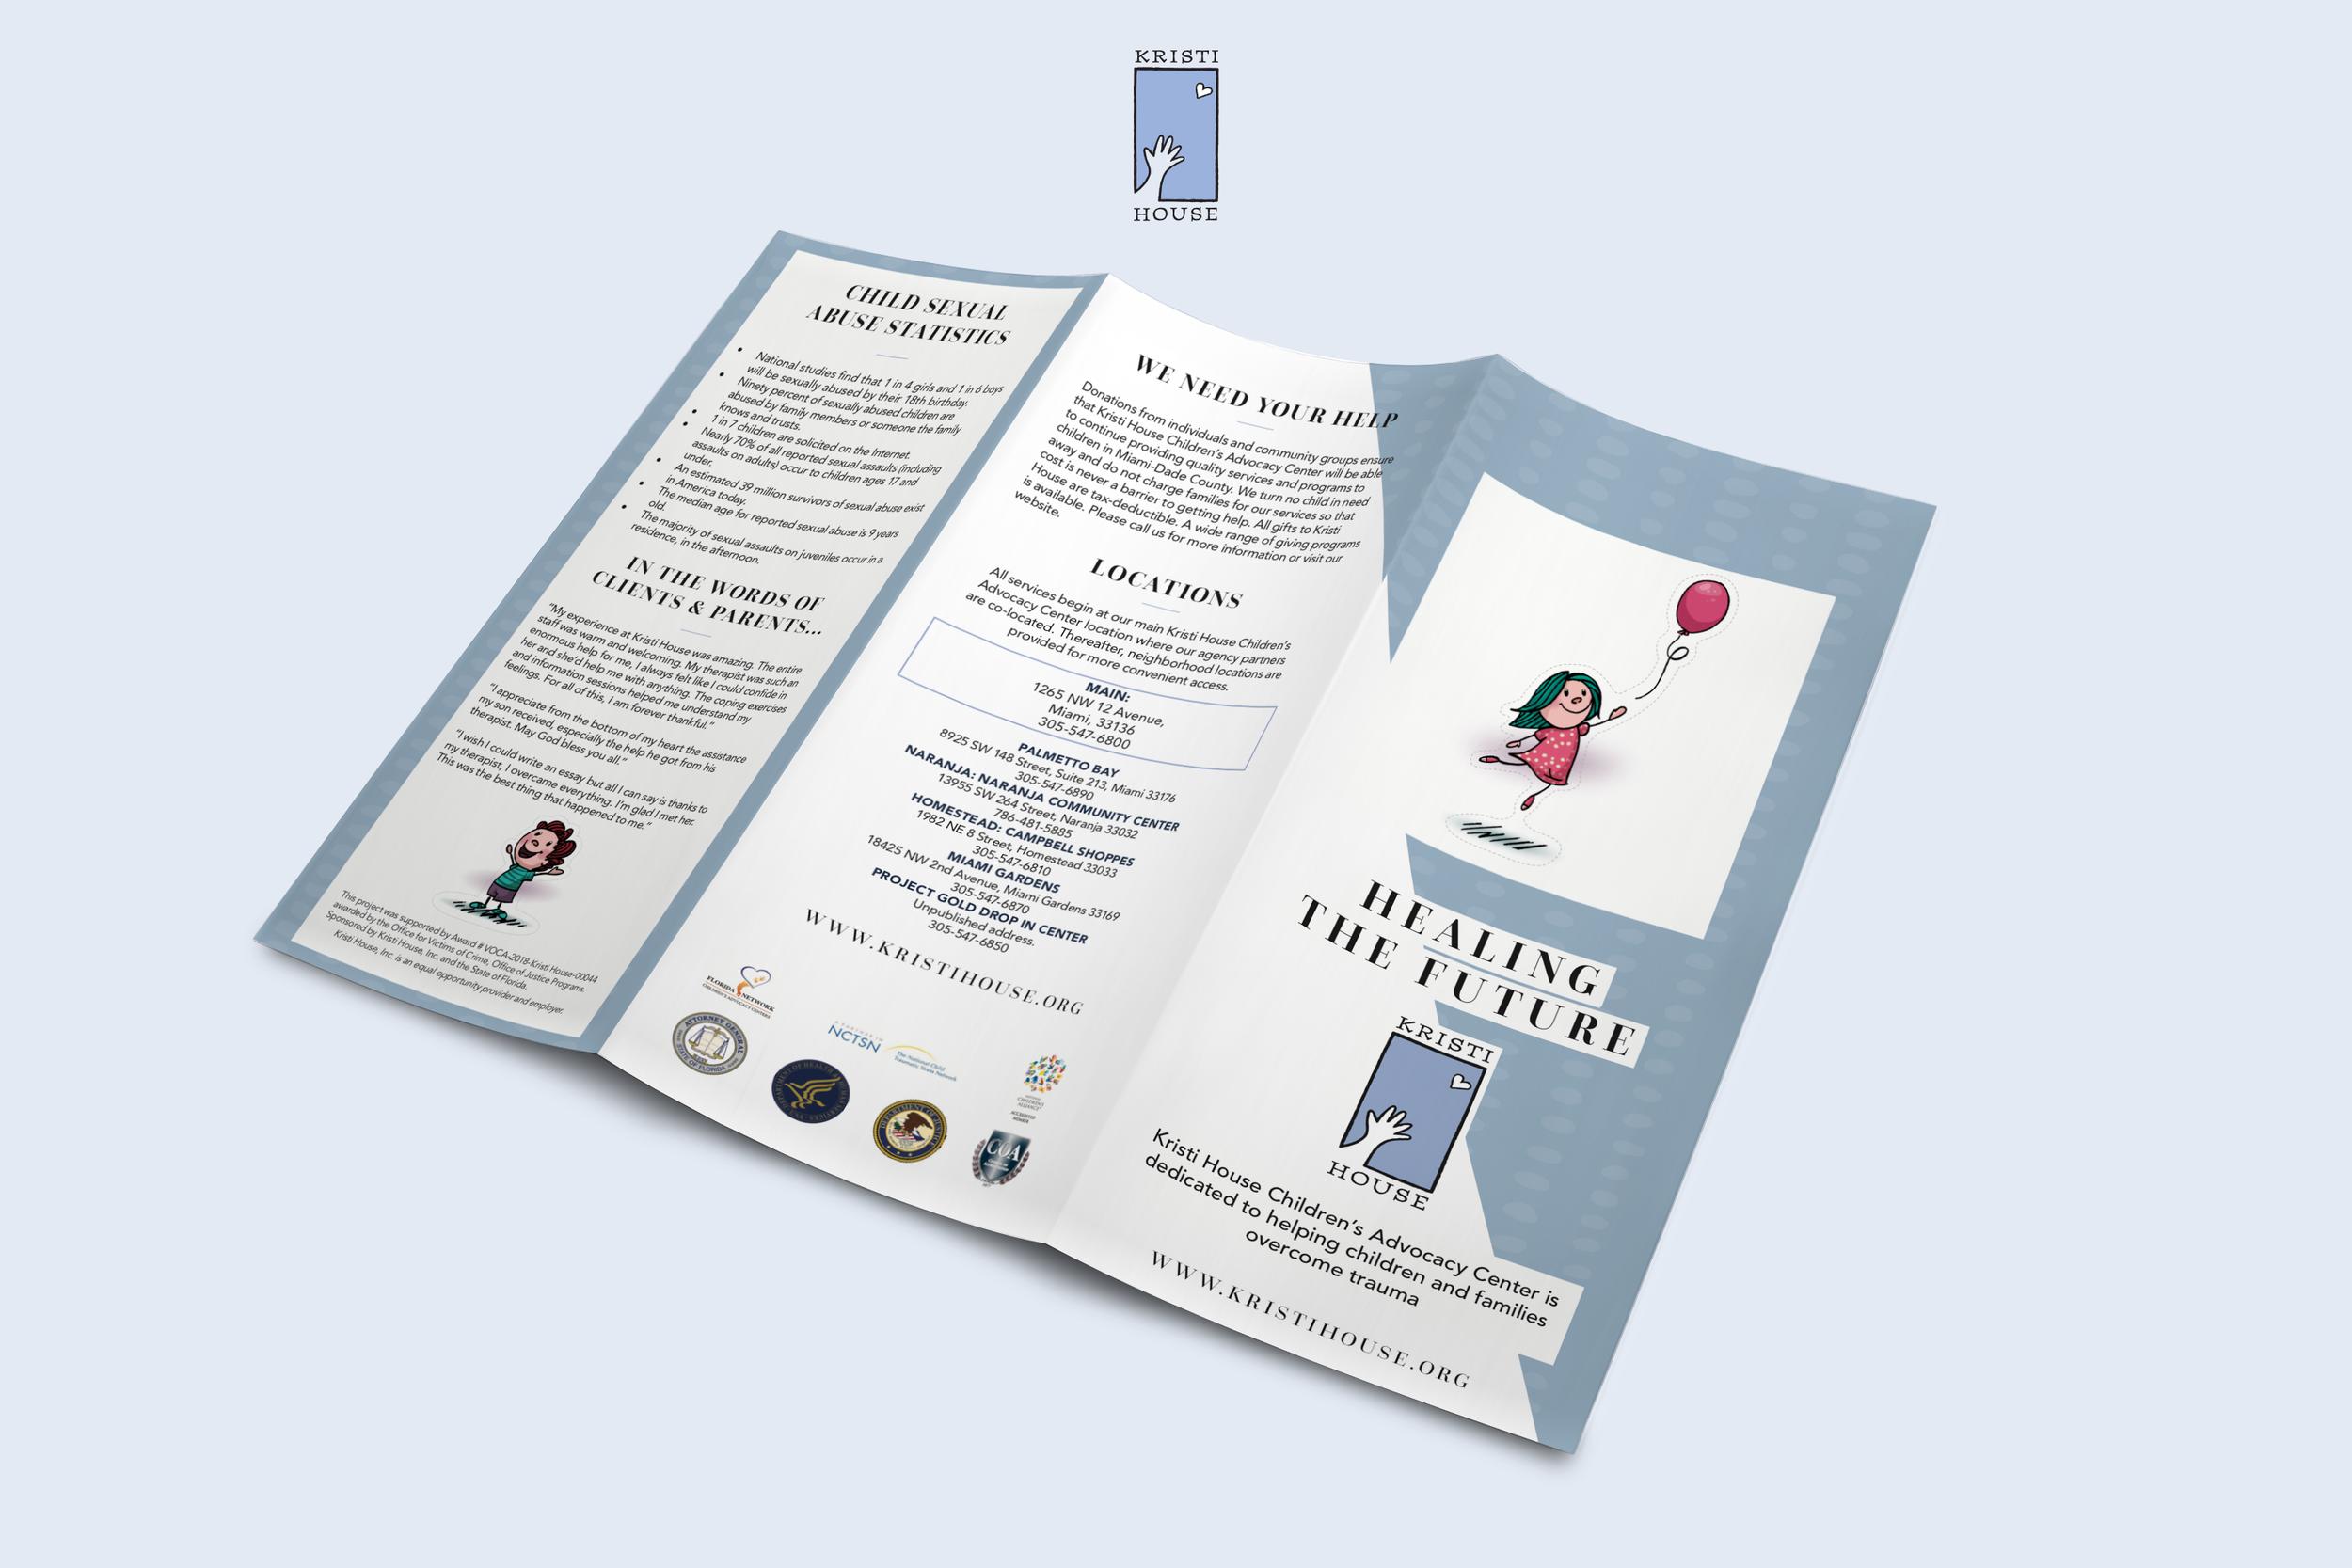 kristi house brochure 2.png